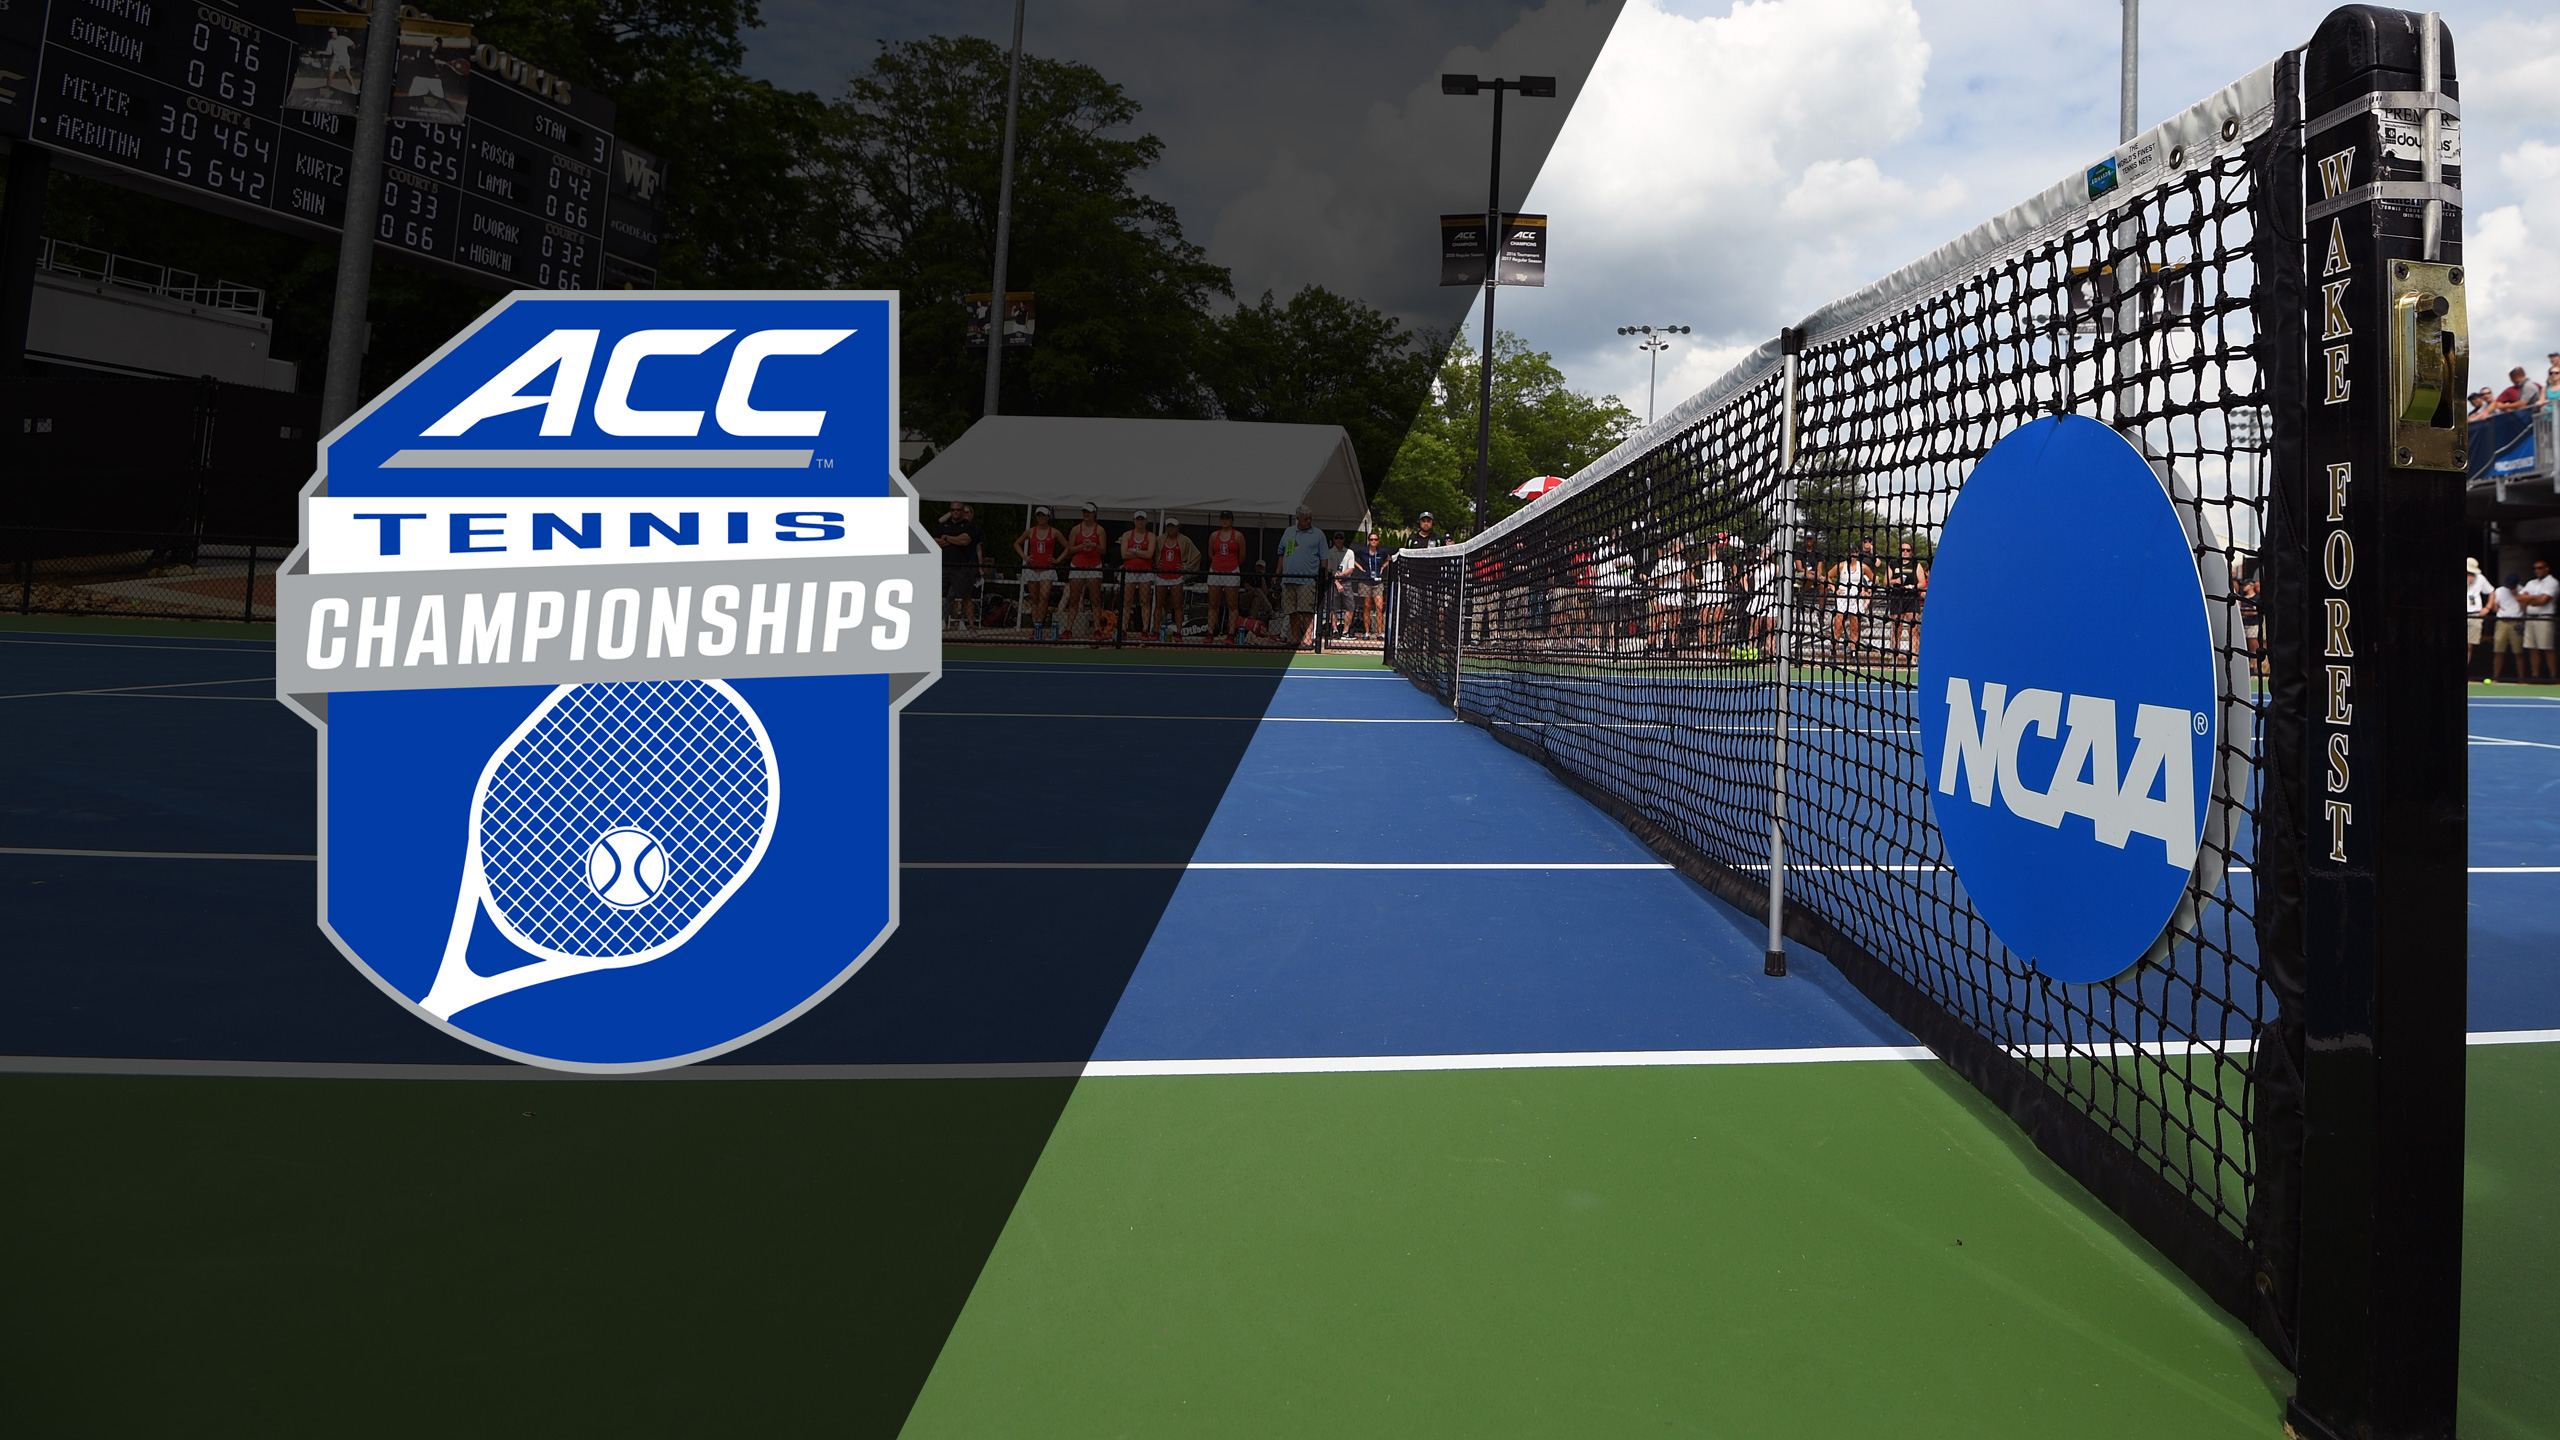 ACC Women's Tennis Championship (Women's Final)